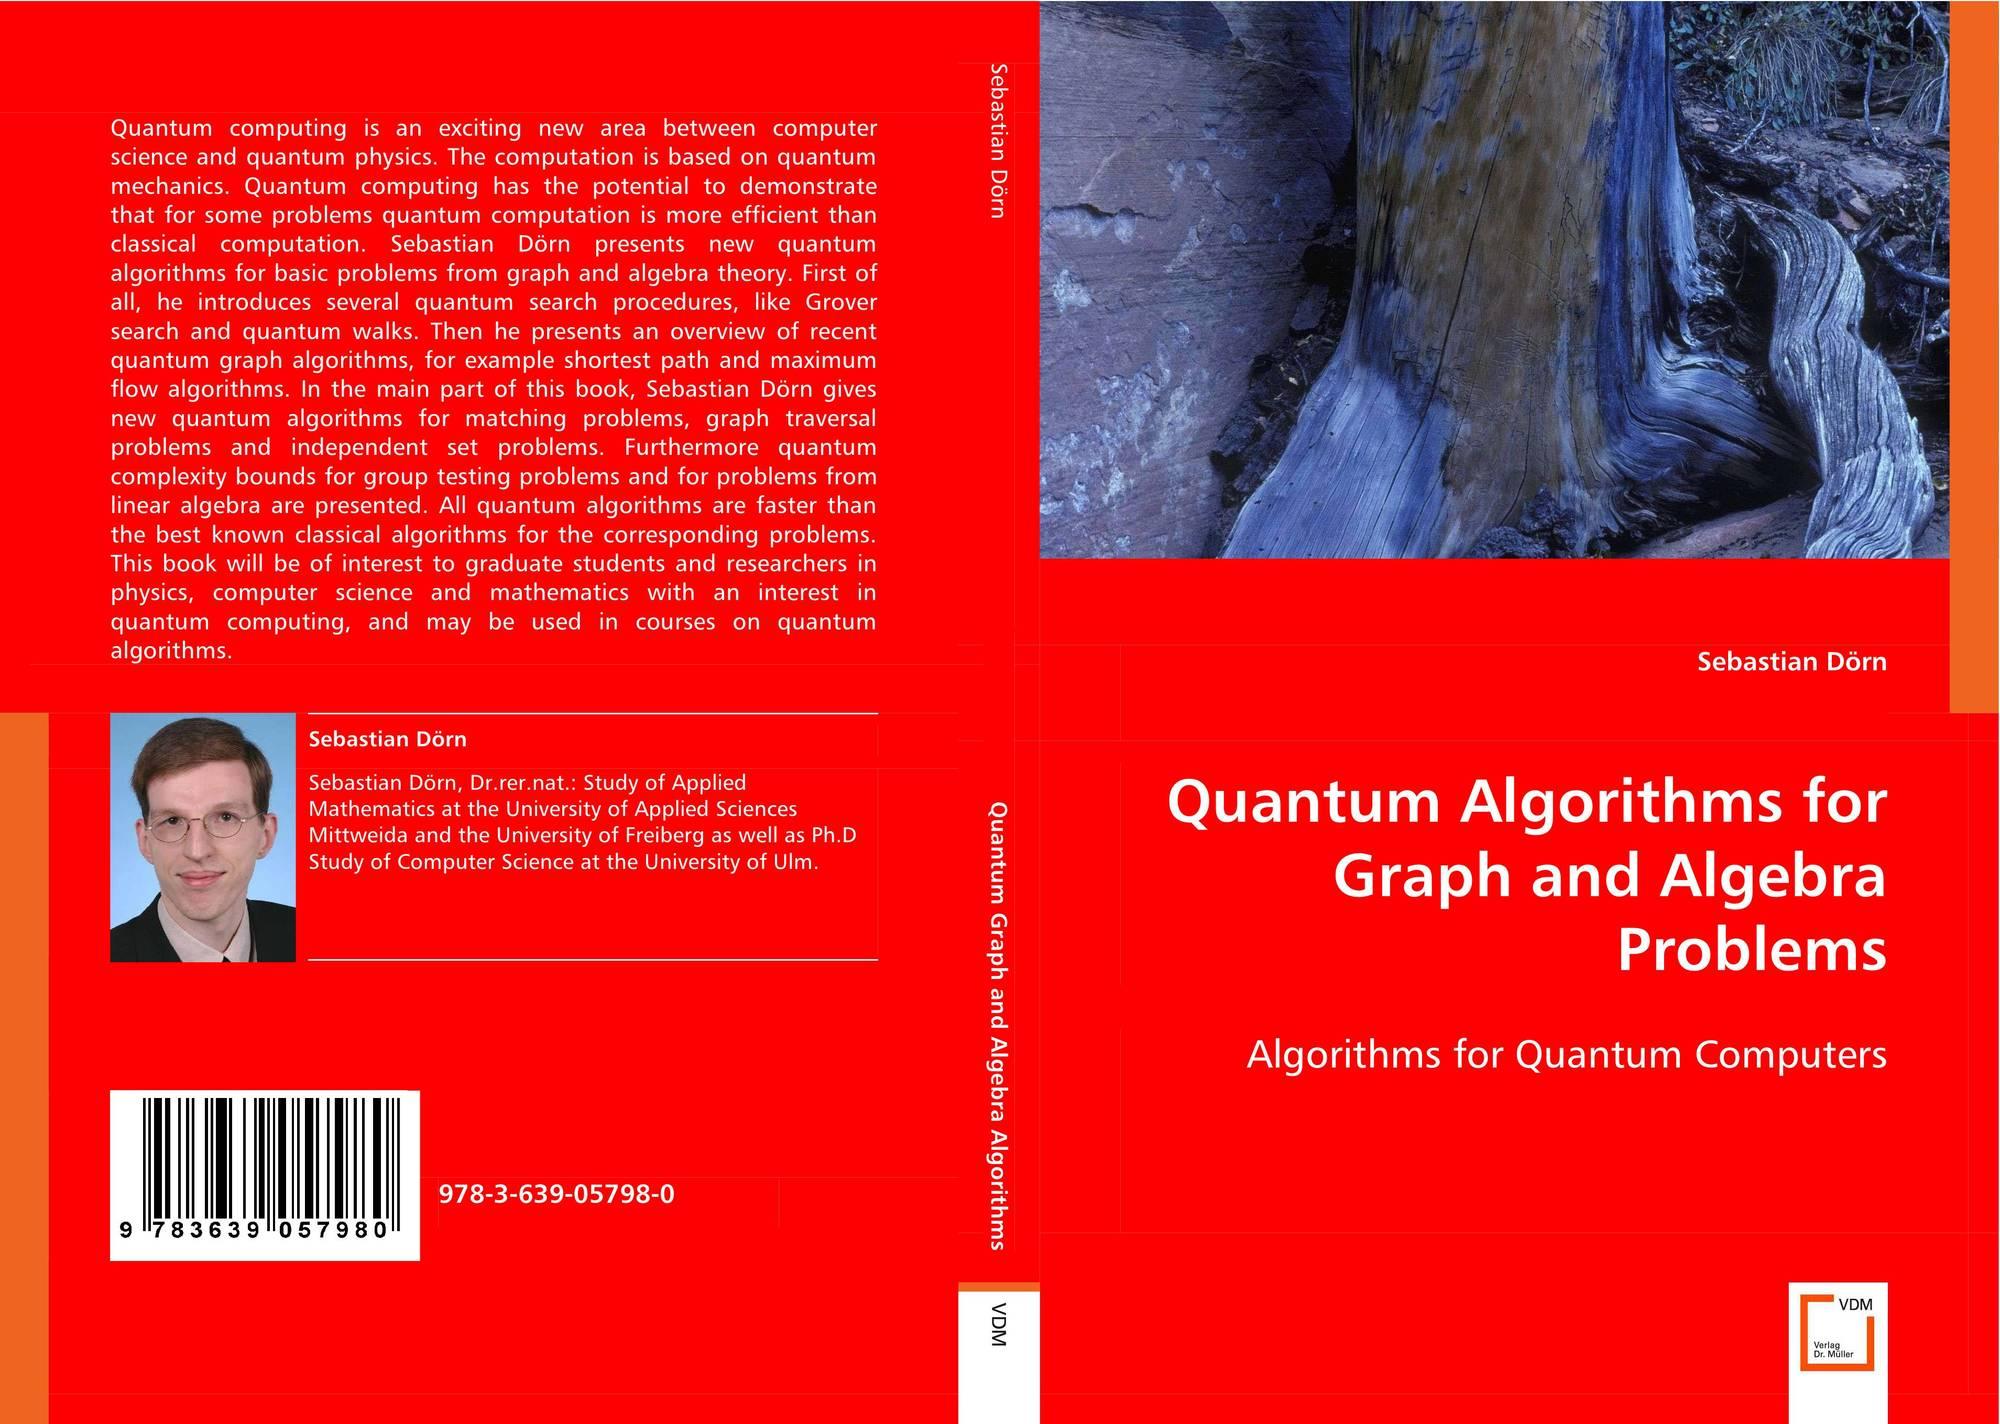 Quantum Algorithms for Graph and Algebra Problems, 978-3-639